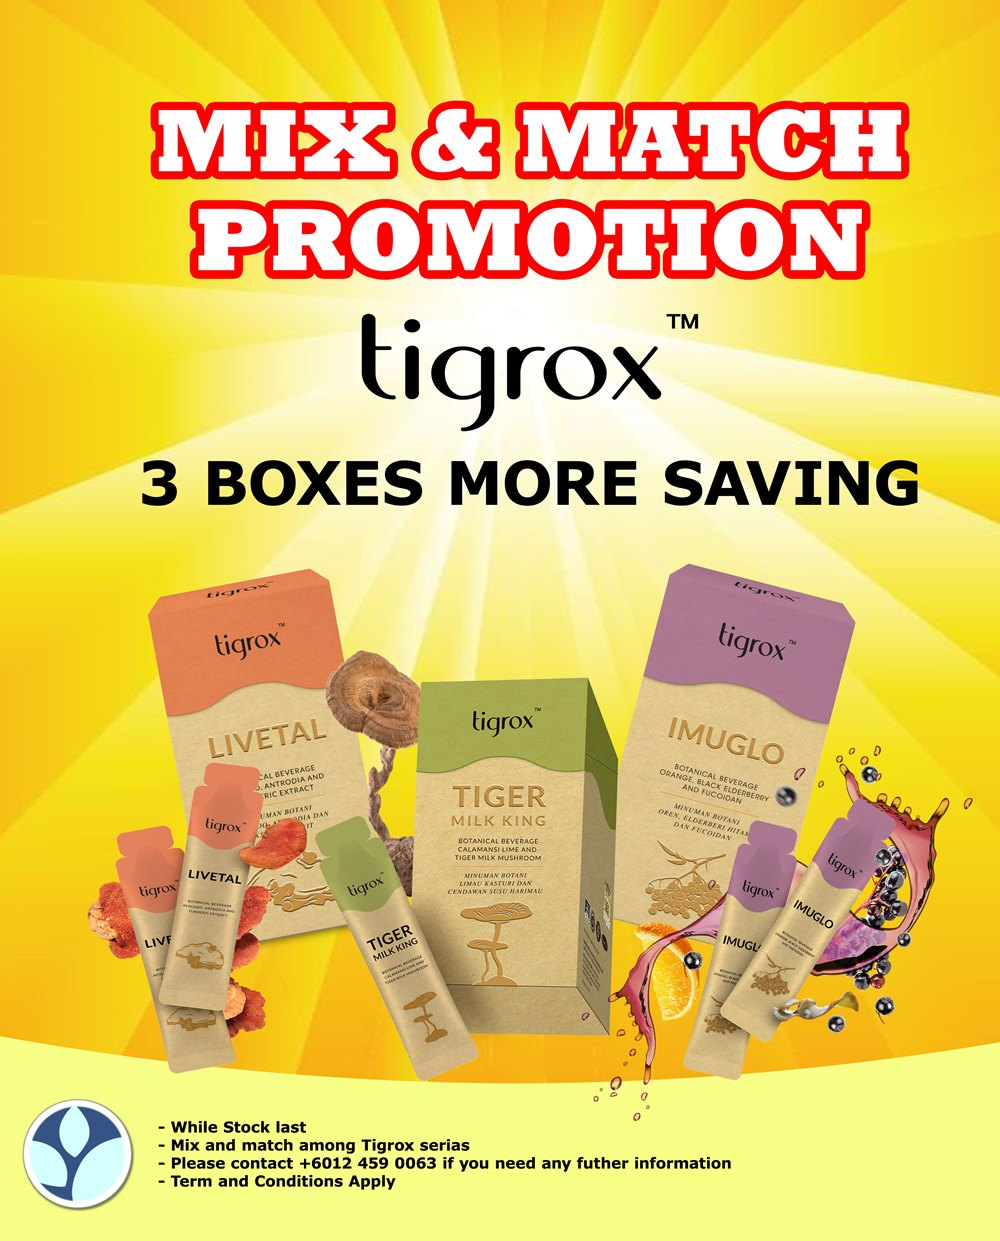 Tigrox Promotion